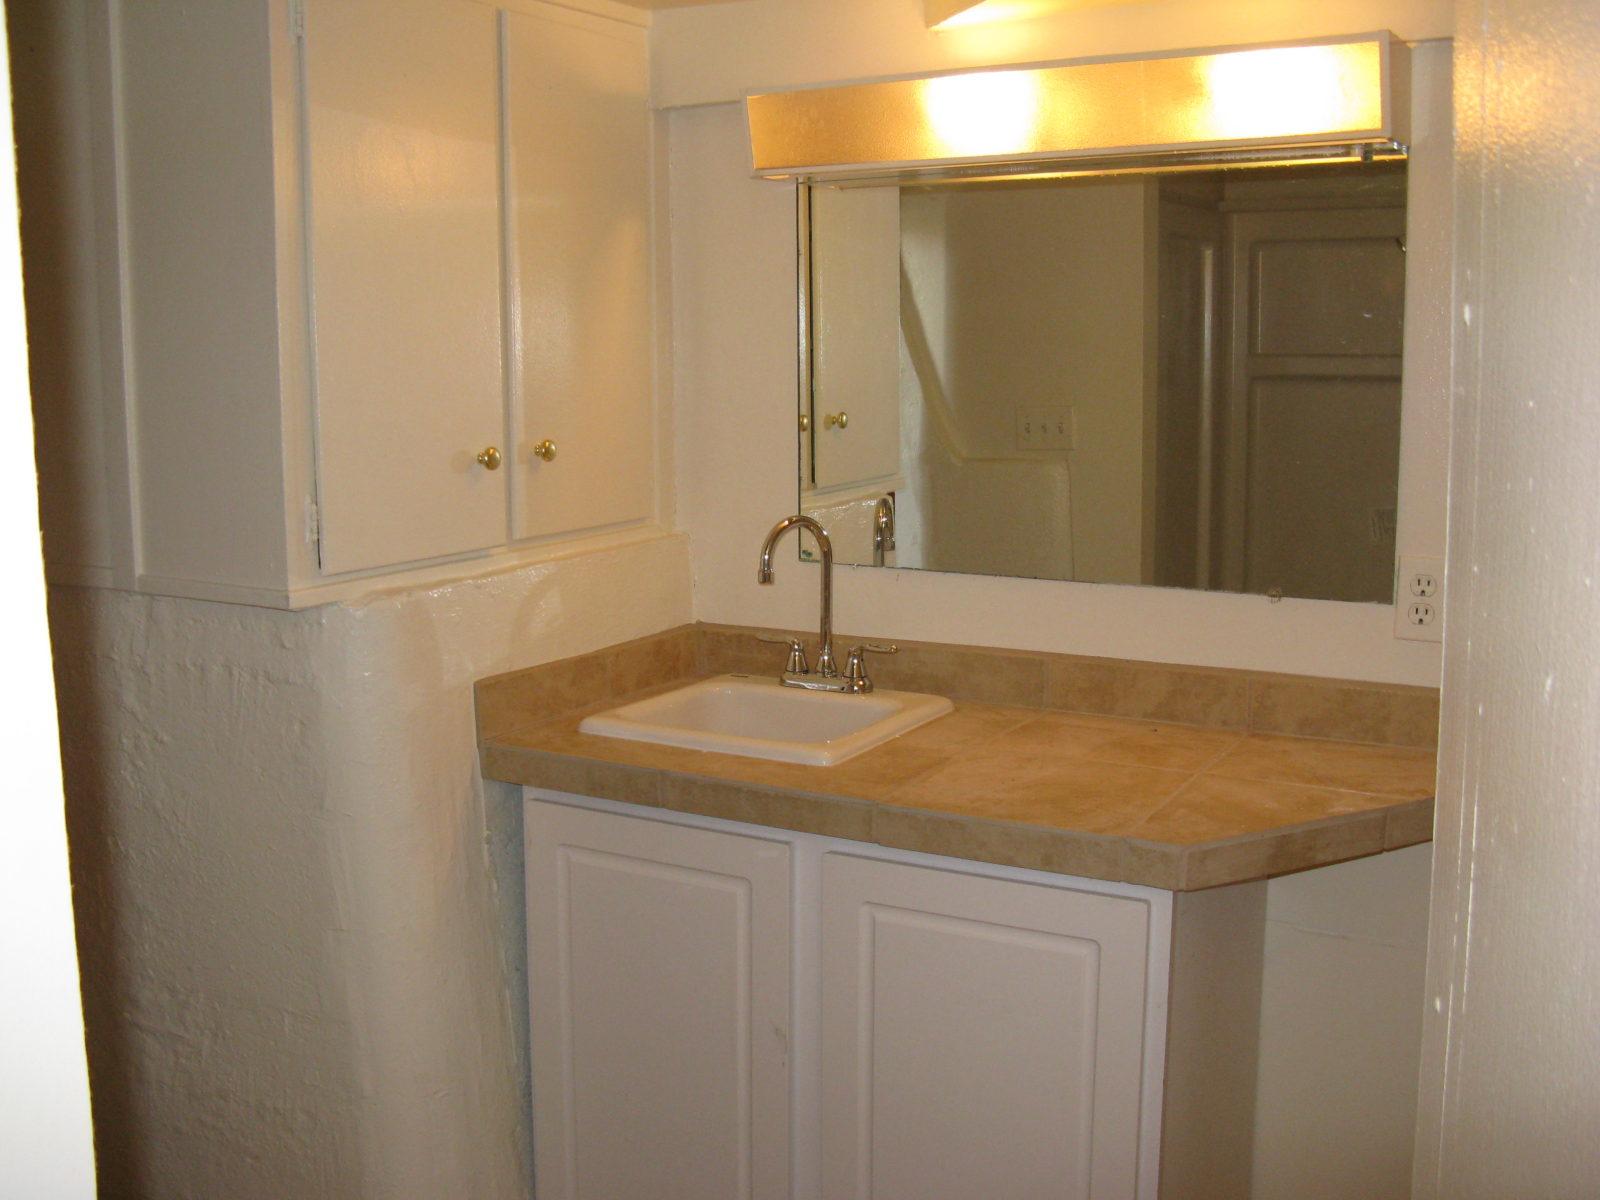 2473: Lower Level Bathroom